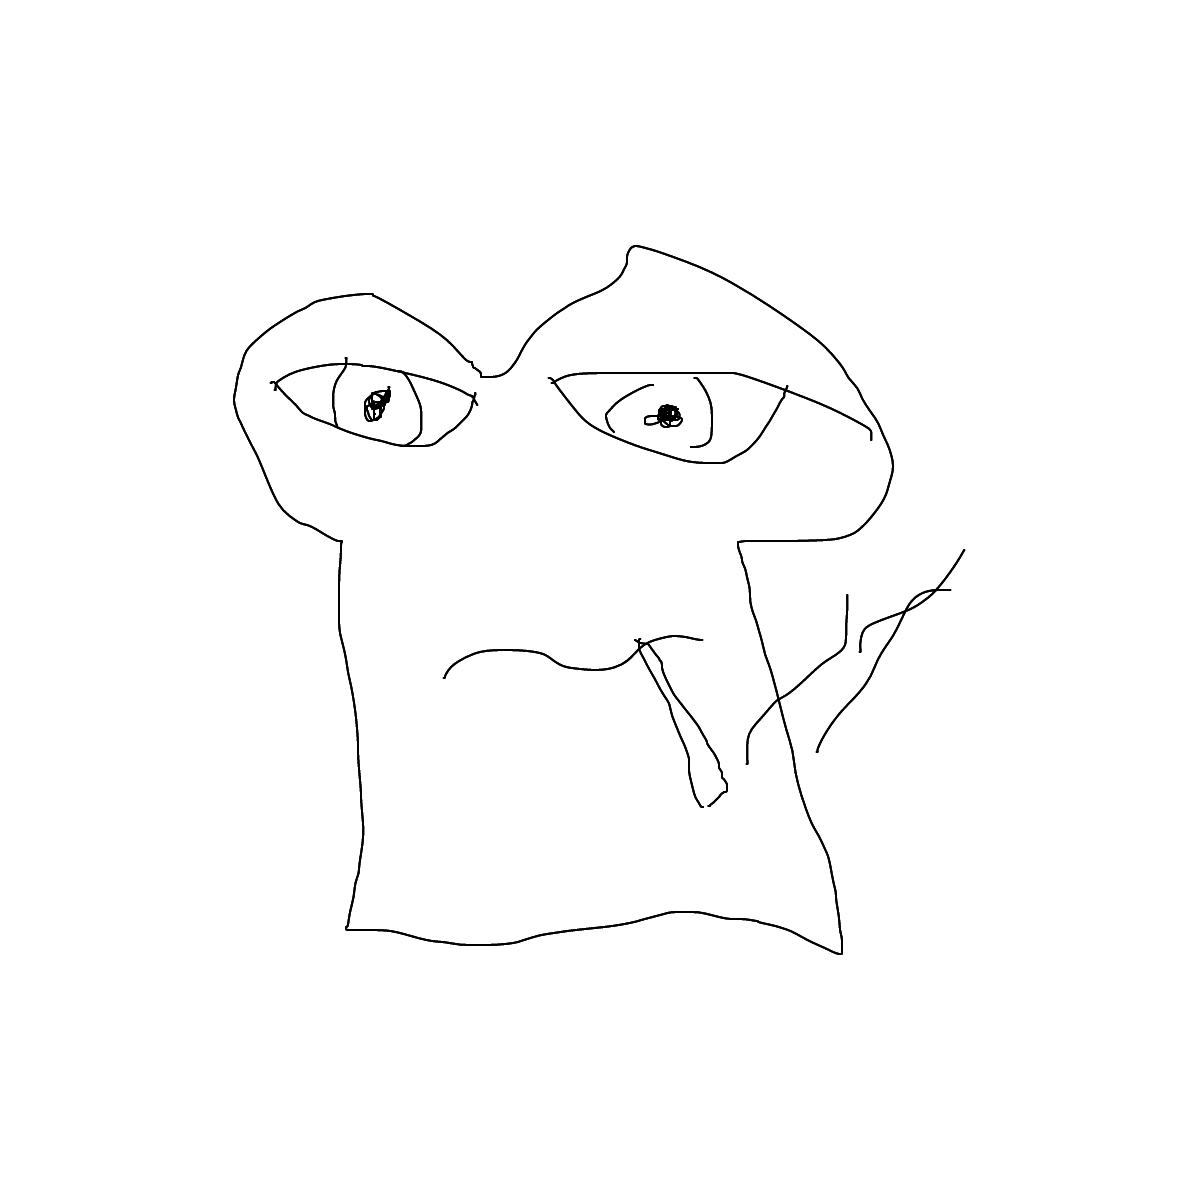 BAAAM drawing#106 lat:43.9578132629394500lng: -79.4729995727539000